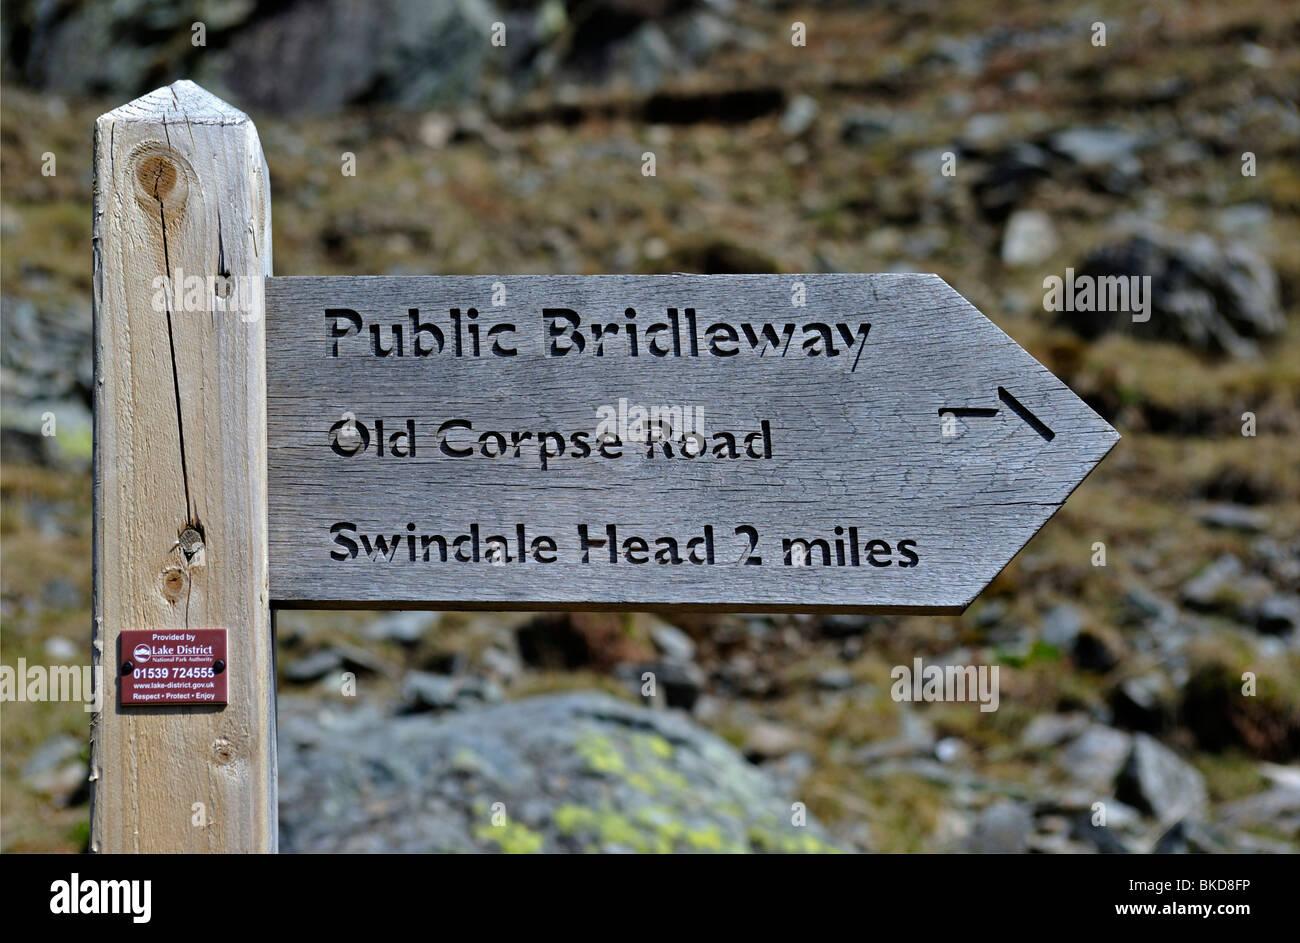 public-bridleway-fingerpost-old-corpse-road-swindale-head-2miles-mardale-BKD8FP.jpg